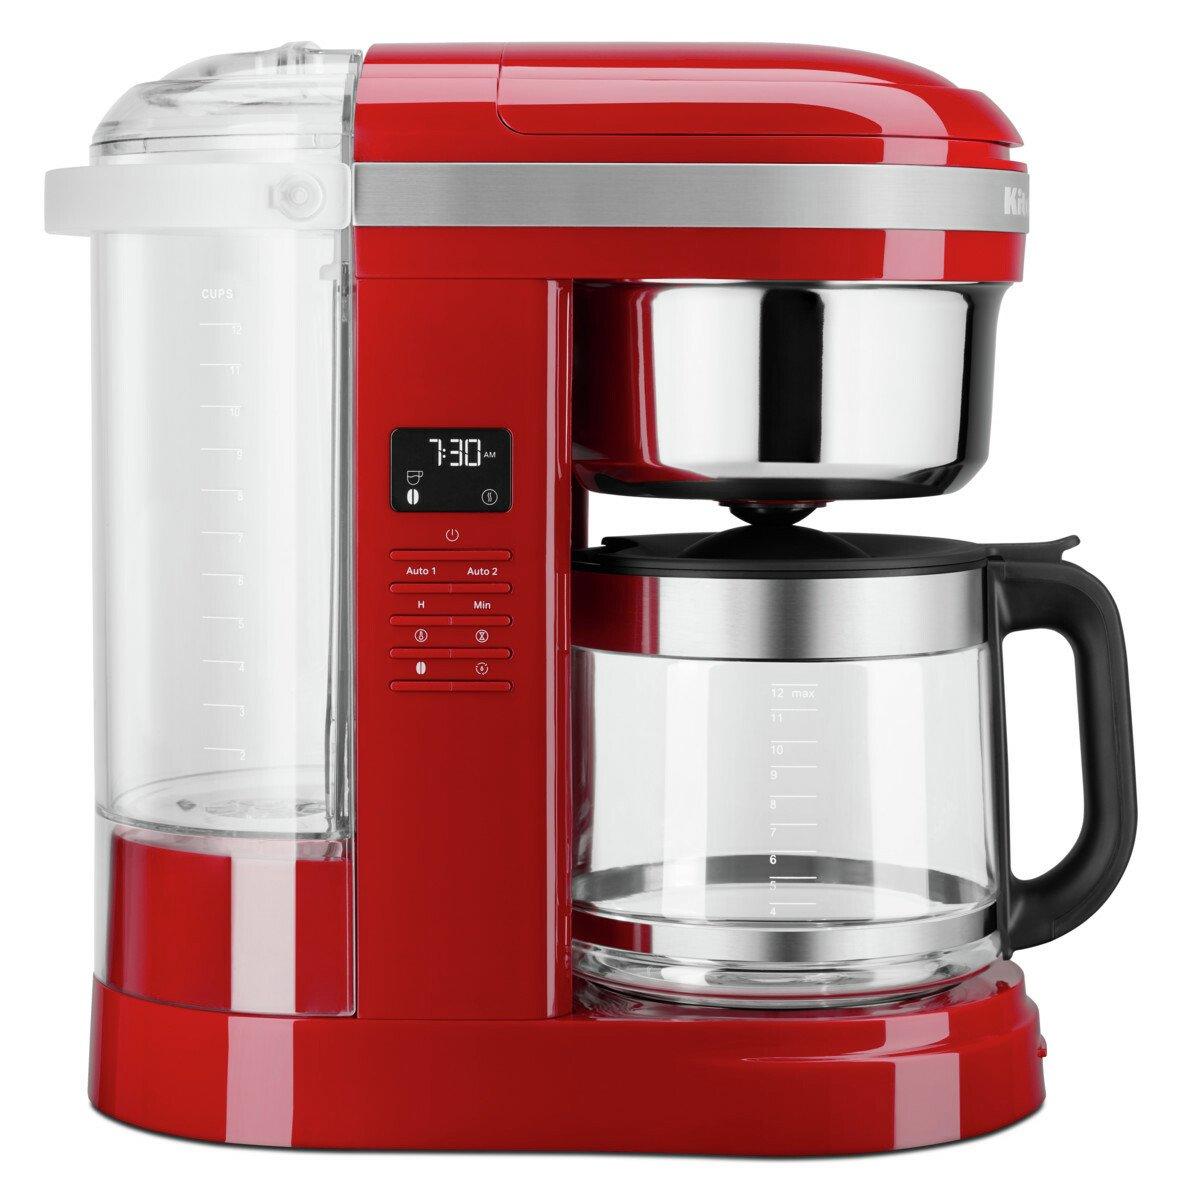 KitchenAid 5KCM1209BER Drip Filter Coffee Machine-Empire Red